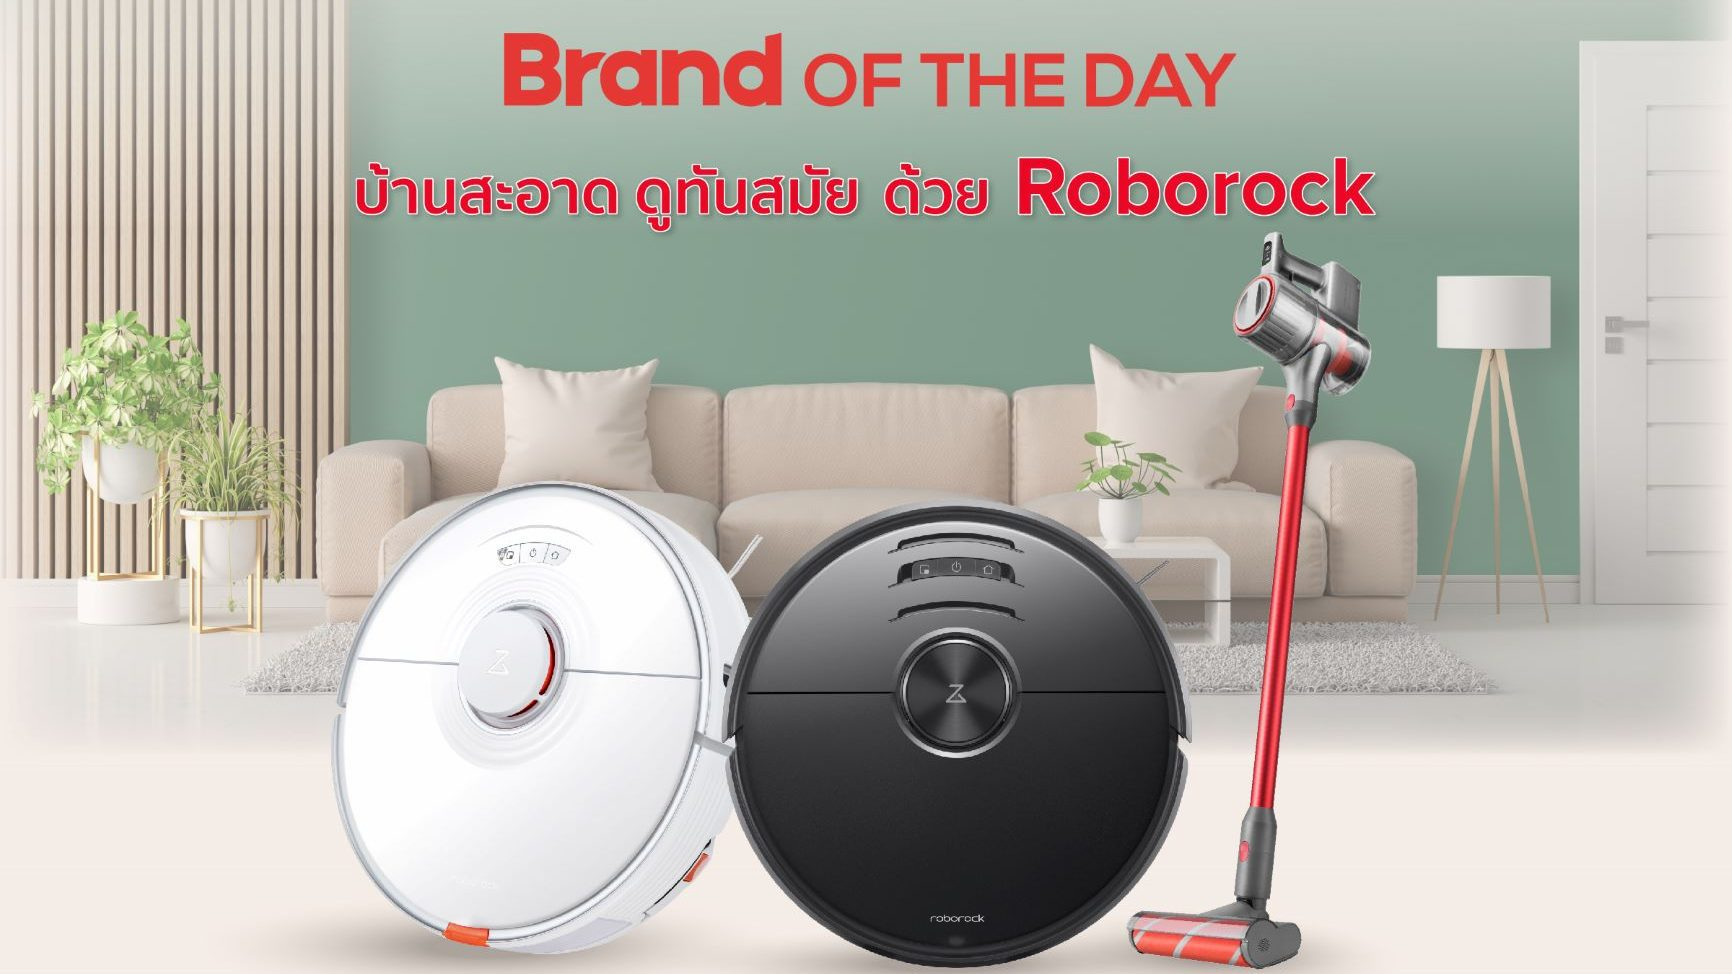 Roborock x Shopee มอบส่วนลดสูงสุด 3,000 บาท ในแคมเปญ Roborock Brand of the Day เปิดตัวสินค้าใหม่ Roborock H7 เครื่องดูดฝุ่น ไร้สาย ทรงพลังที่สุดแห่งปี